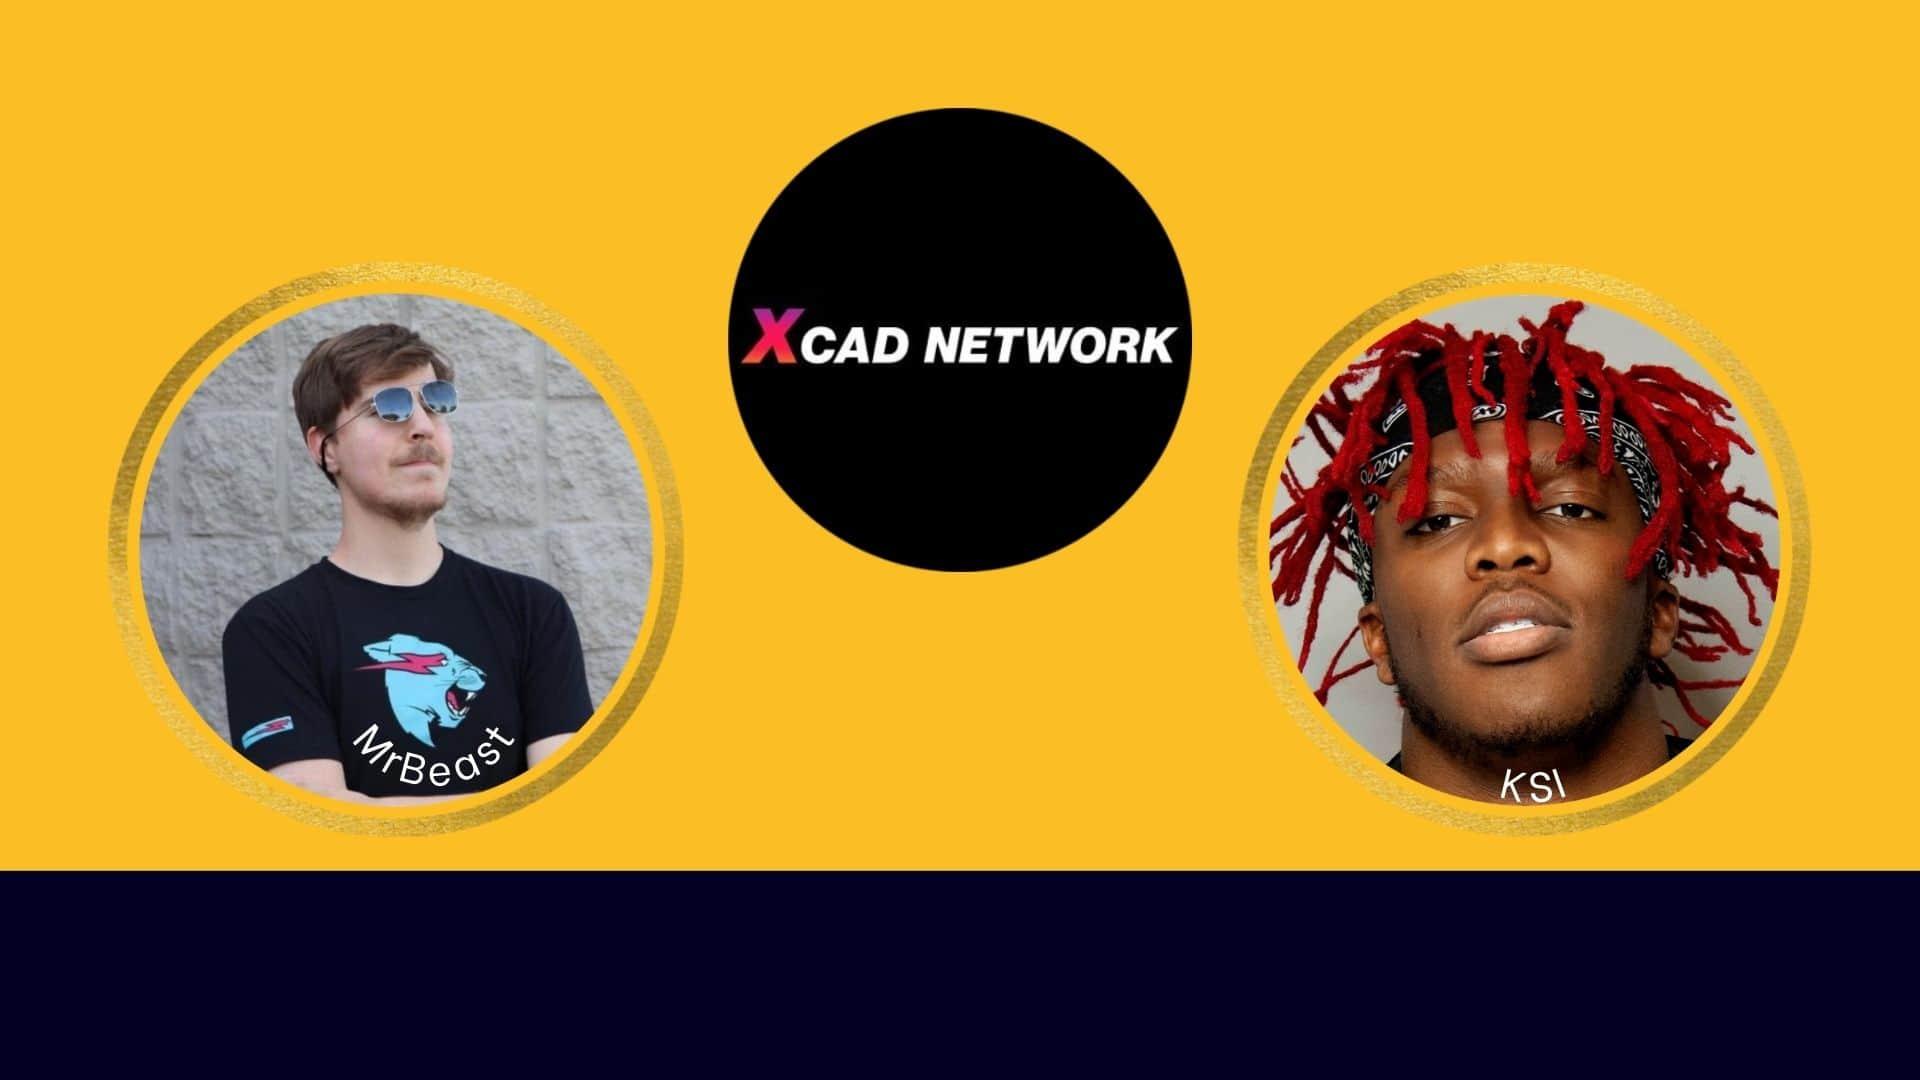 XCAD Network